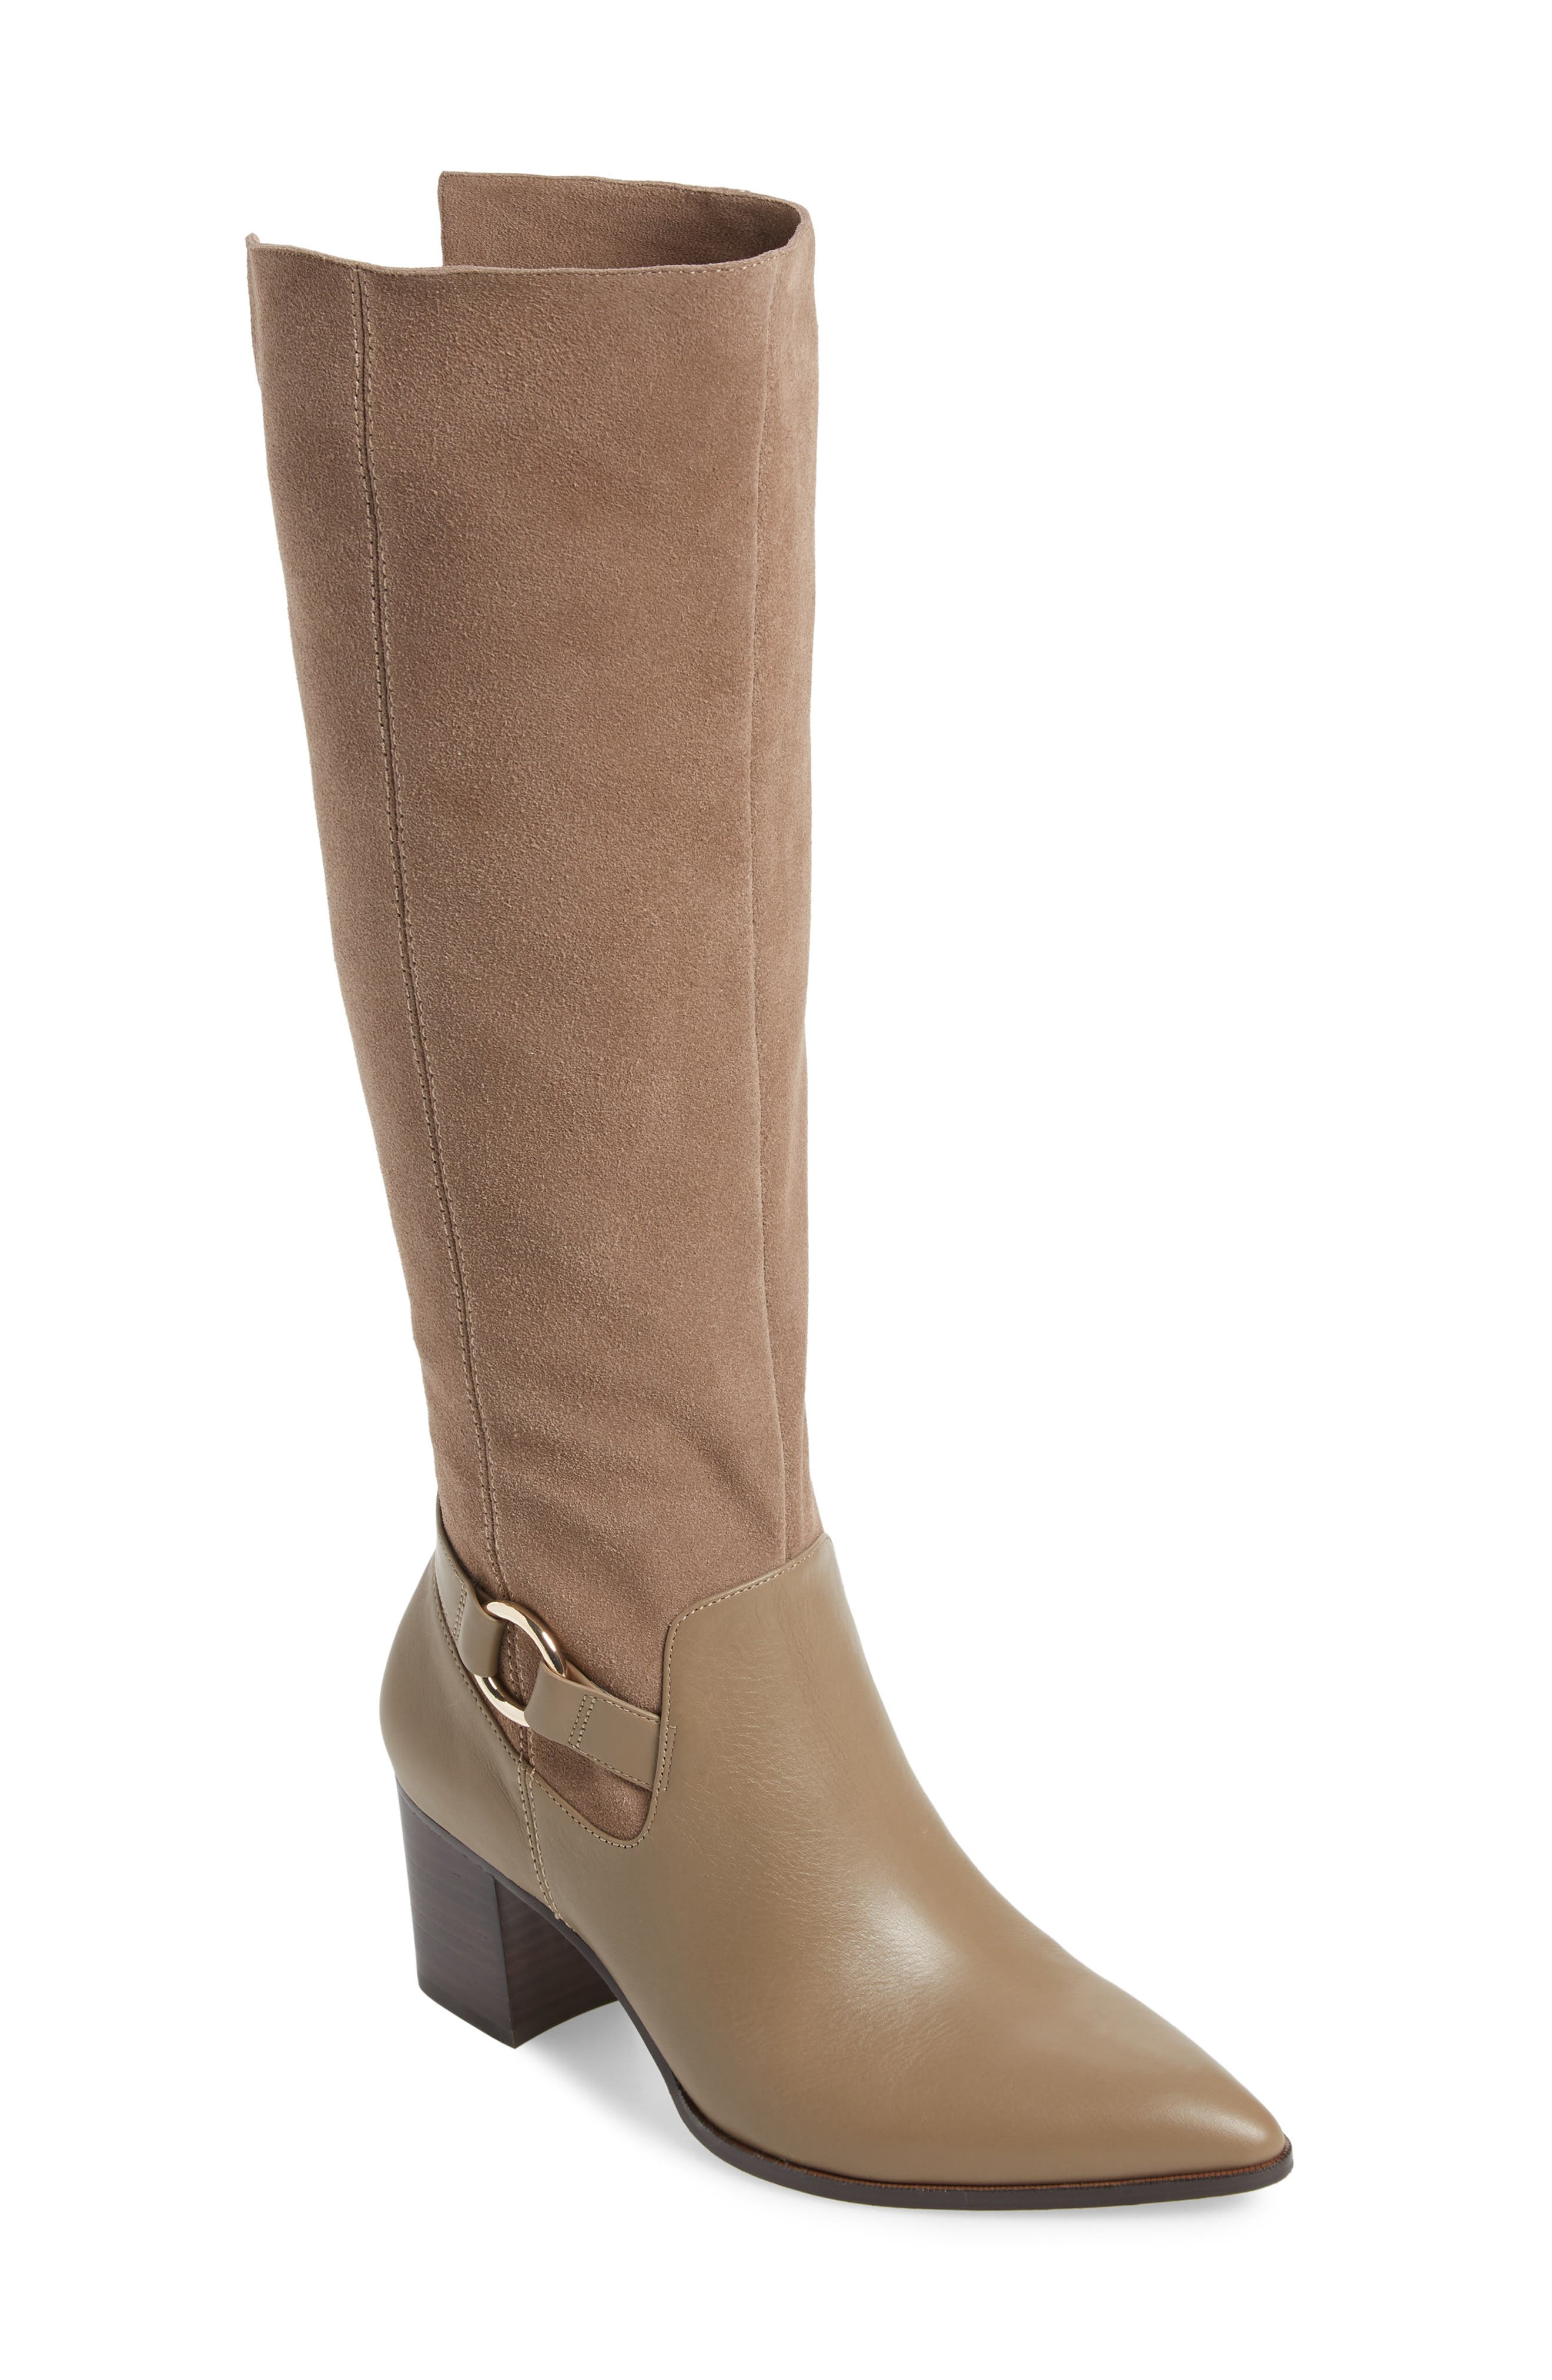 Sole Society Daleena Knee High Boot- Beige